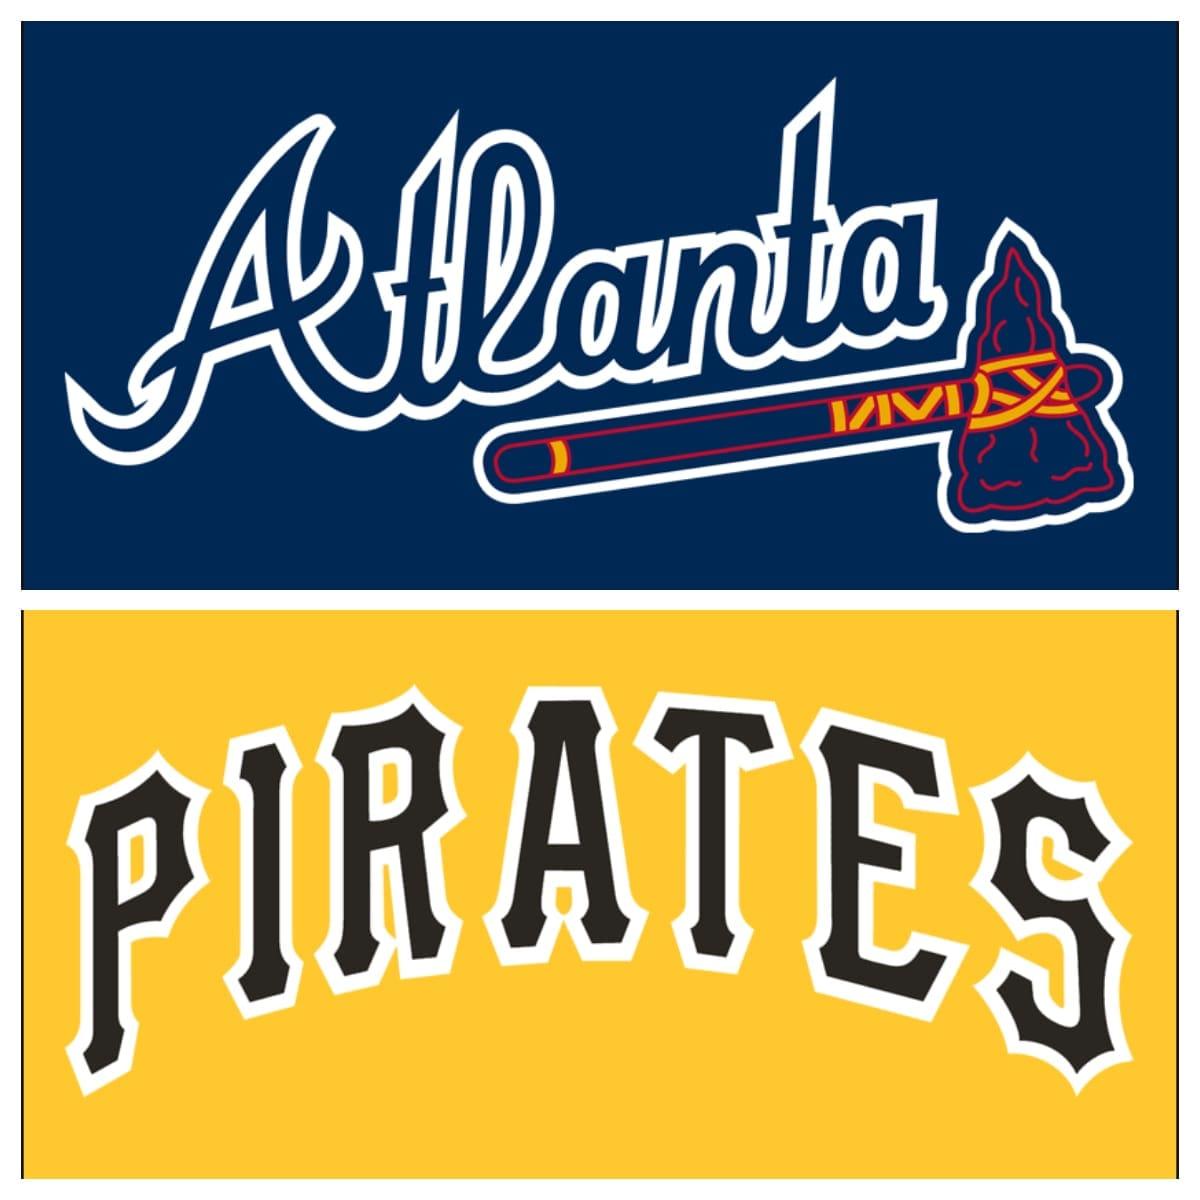 Atlanta Braves vs Pittsburgh Pirates Stats